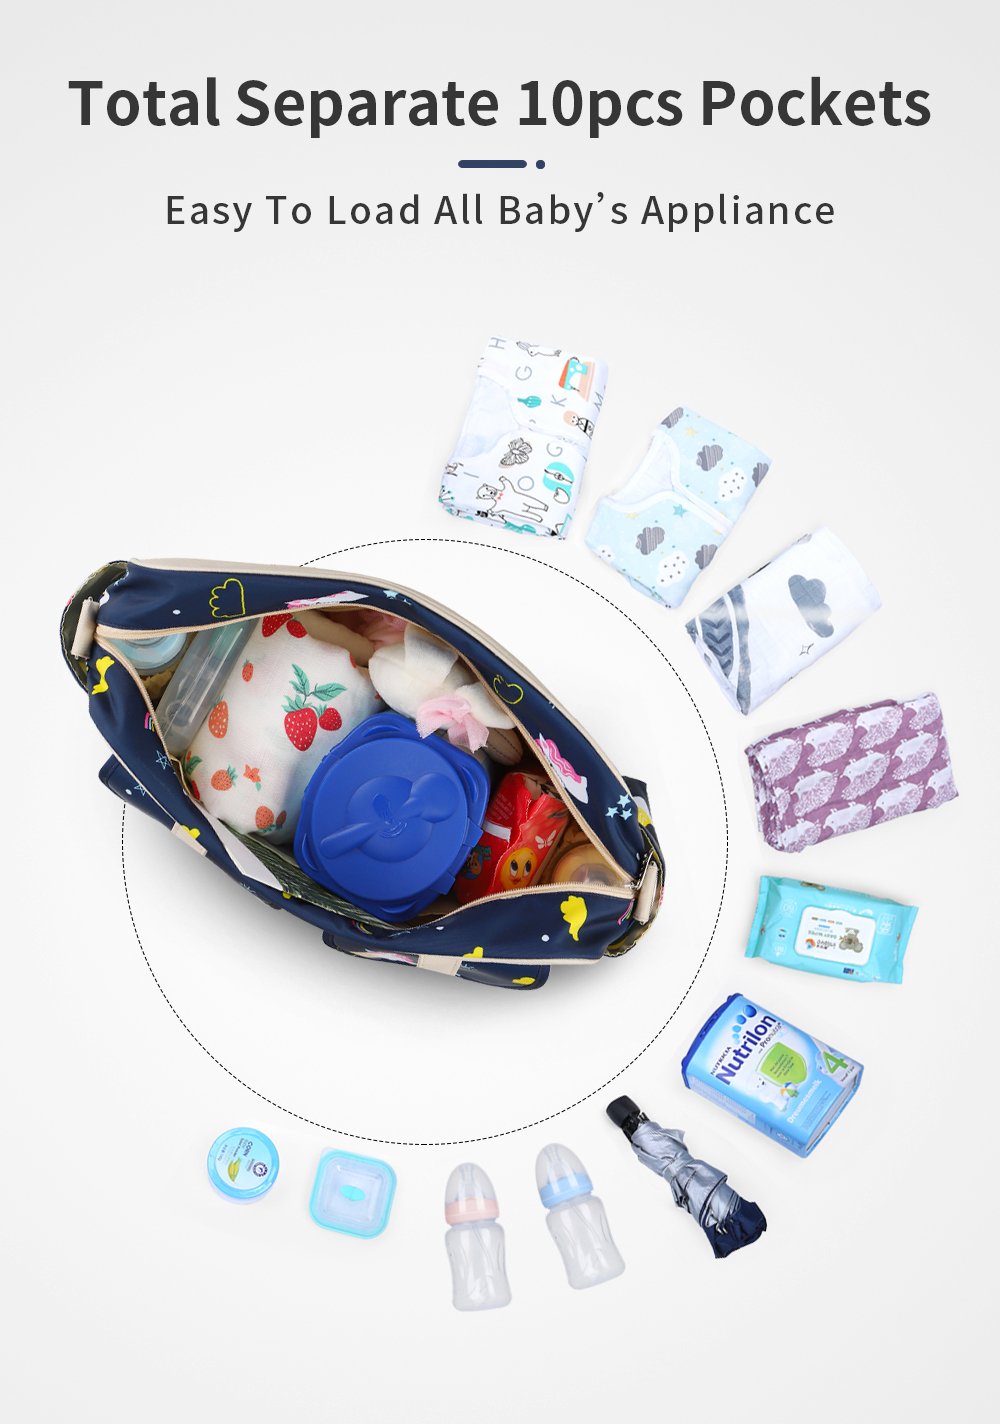 Waterproof Multifunctional Diaper Bag 3